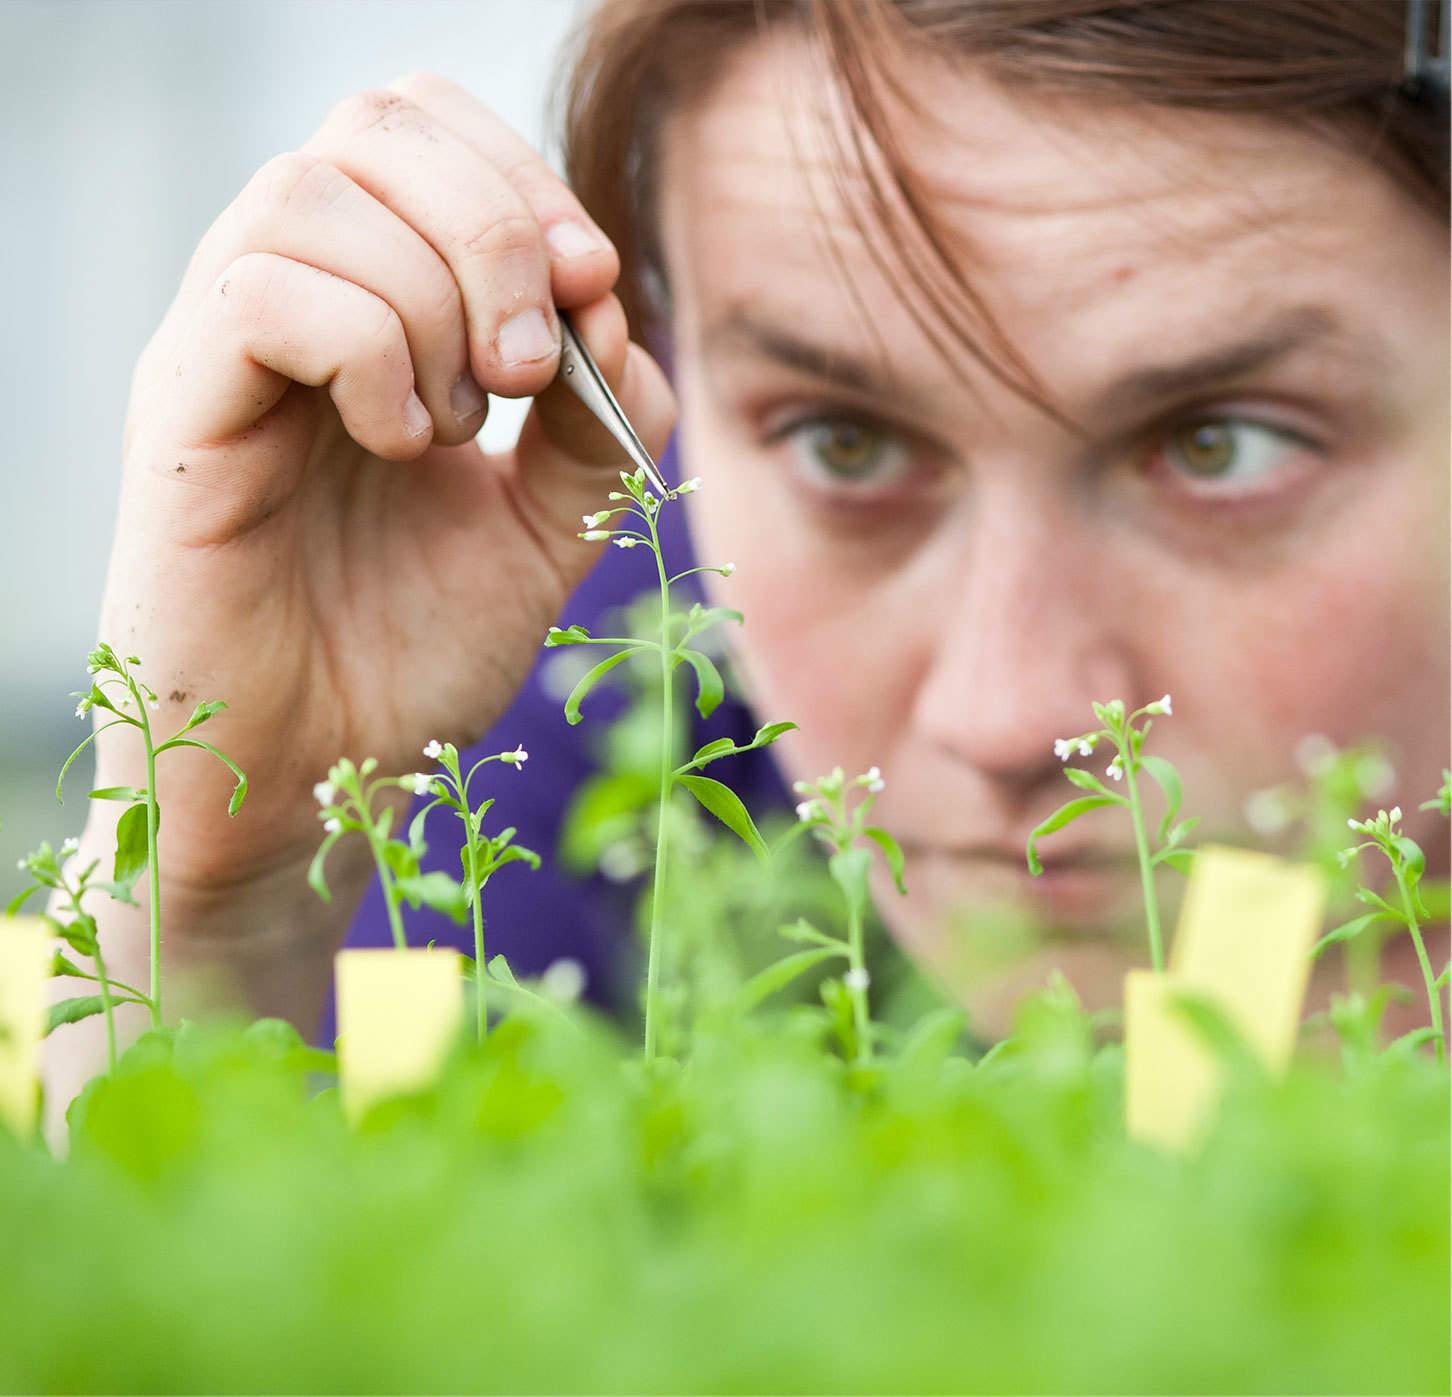 case-van-lanschot-uva-planten-dutchgiraffe